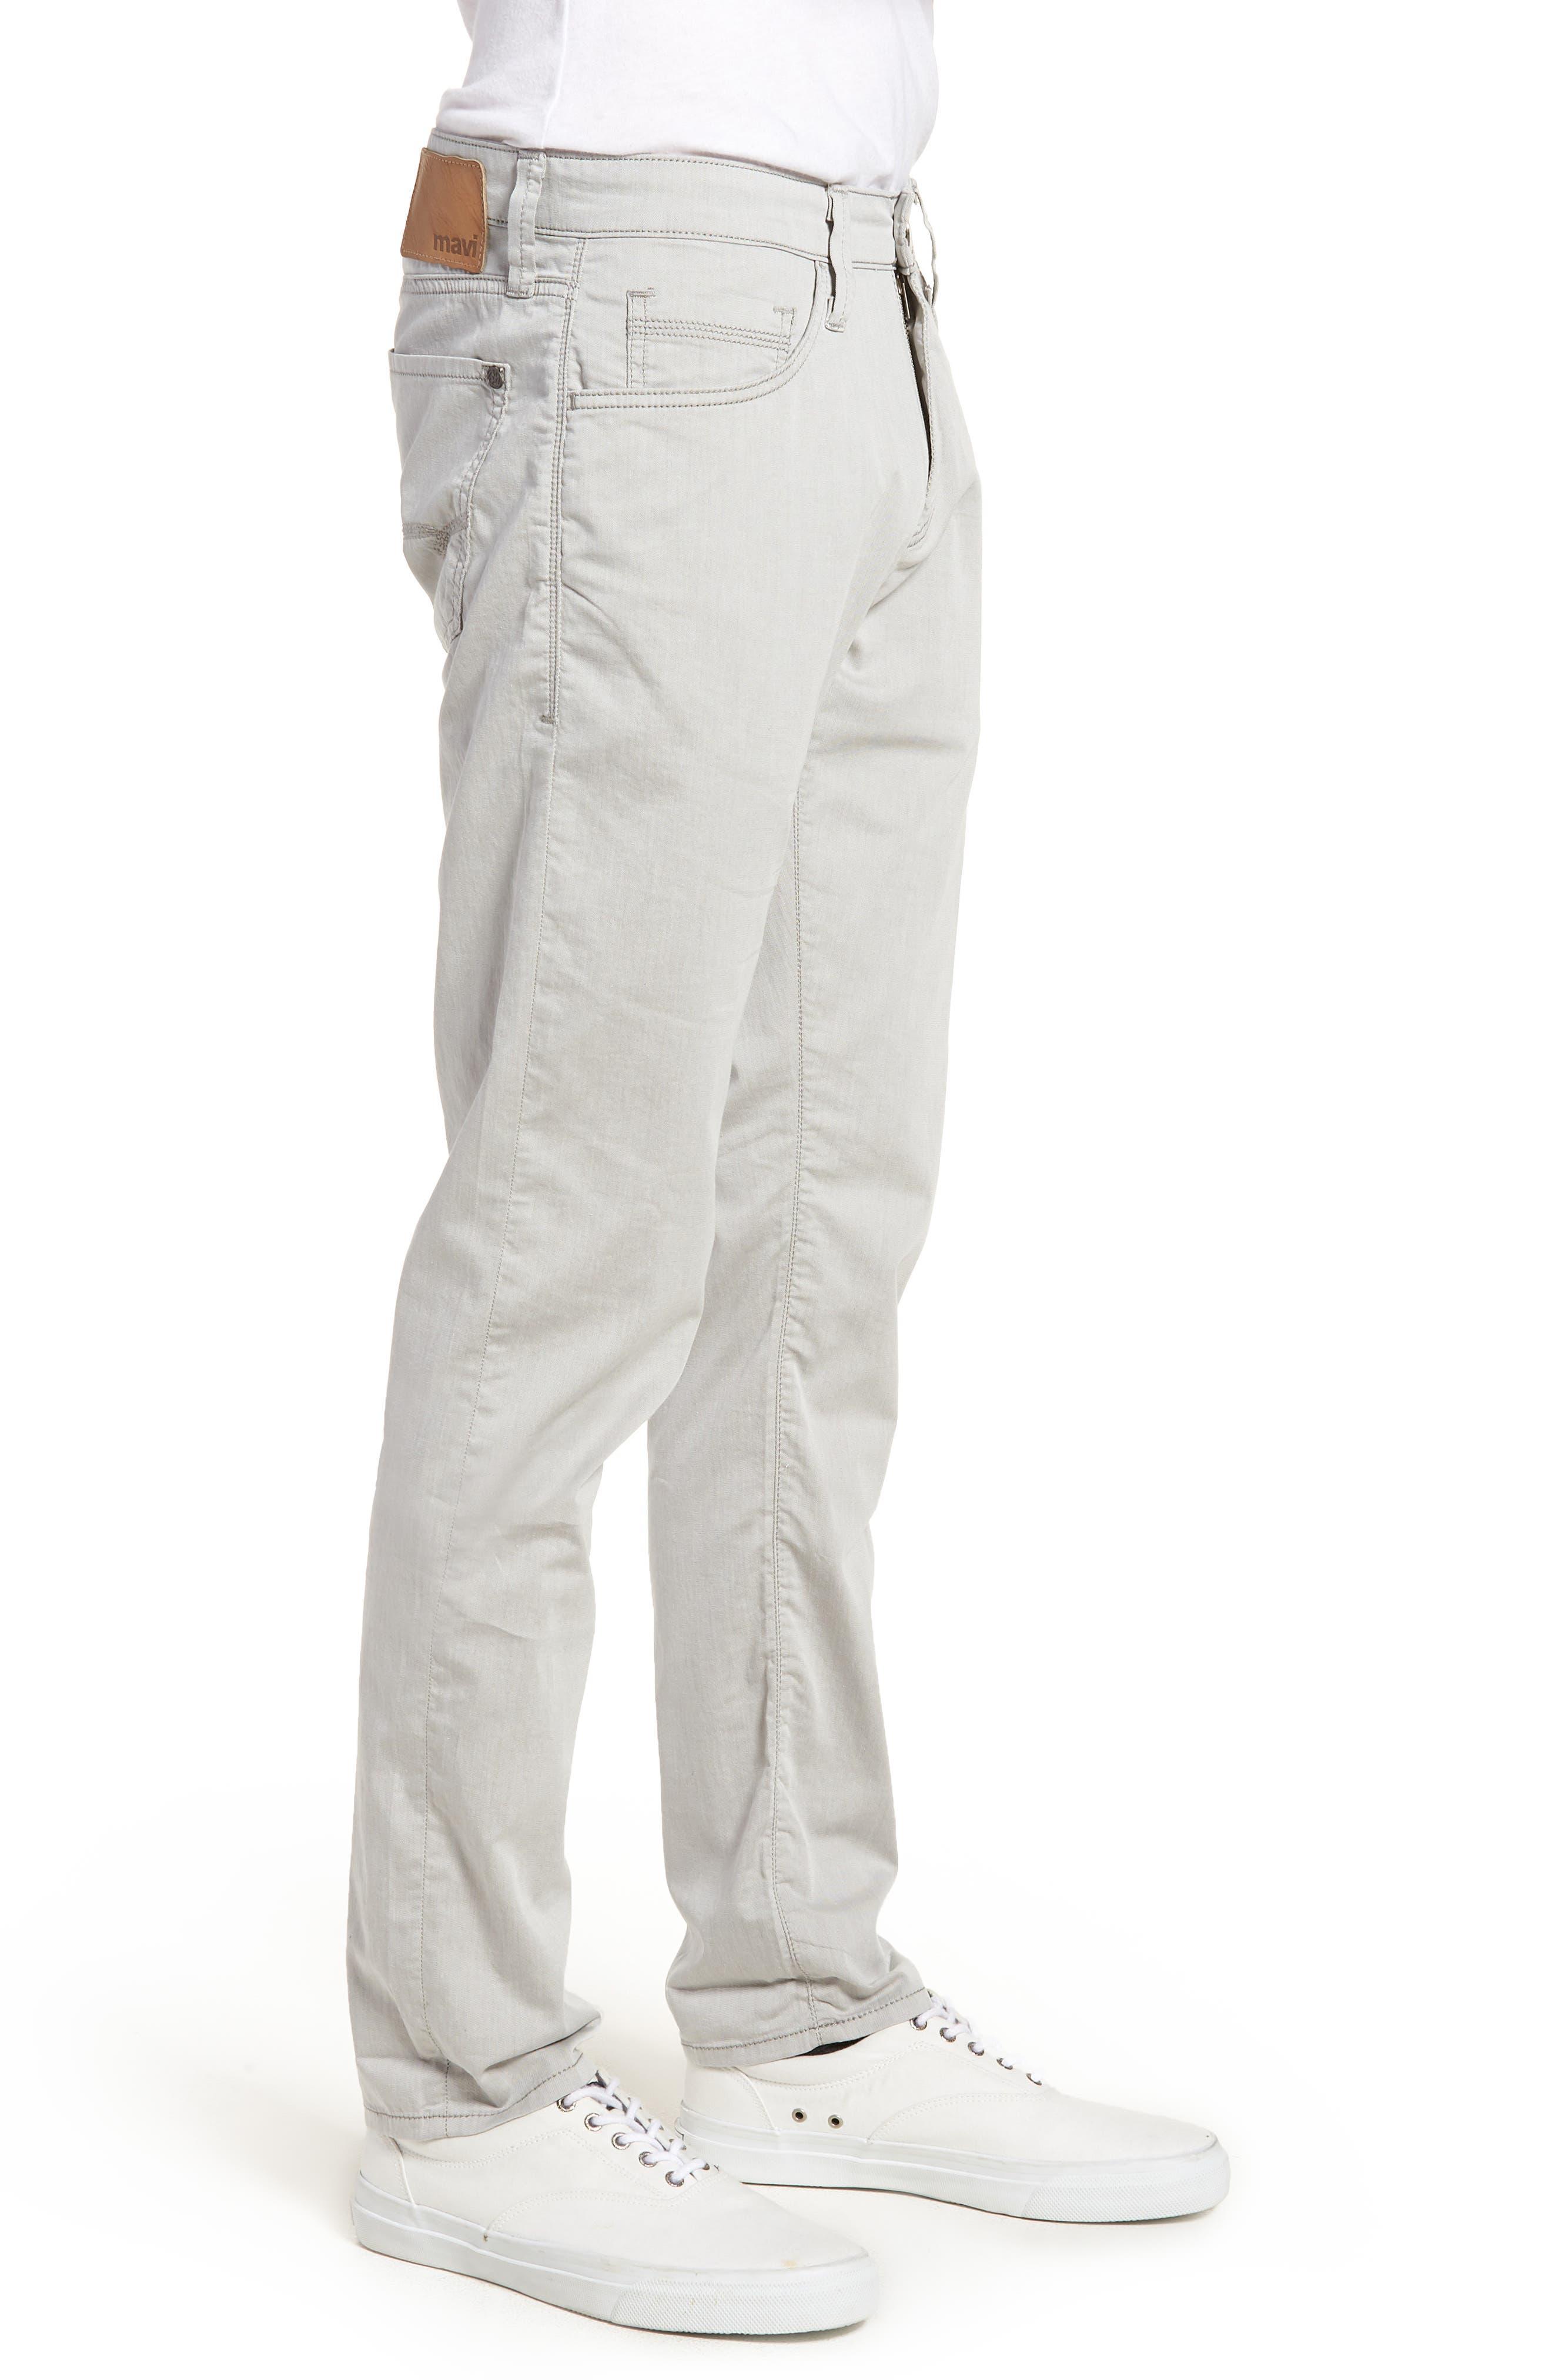 Jake Slim Fit Jeans,                             Alternate thumbnail 3, color,                             Latte Reversed